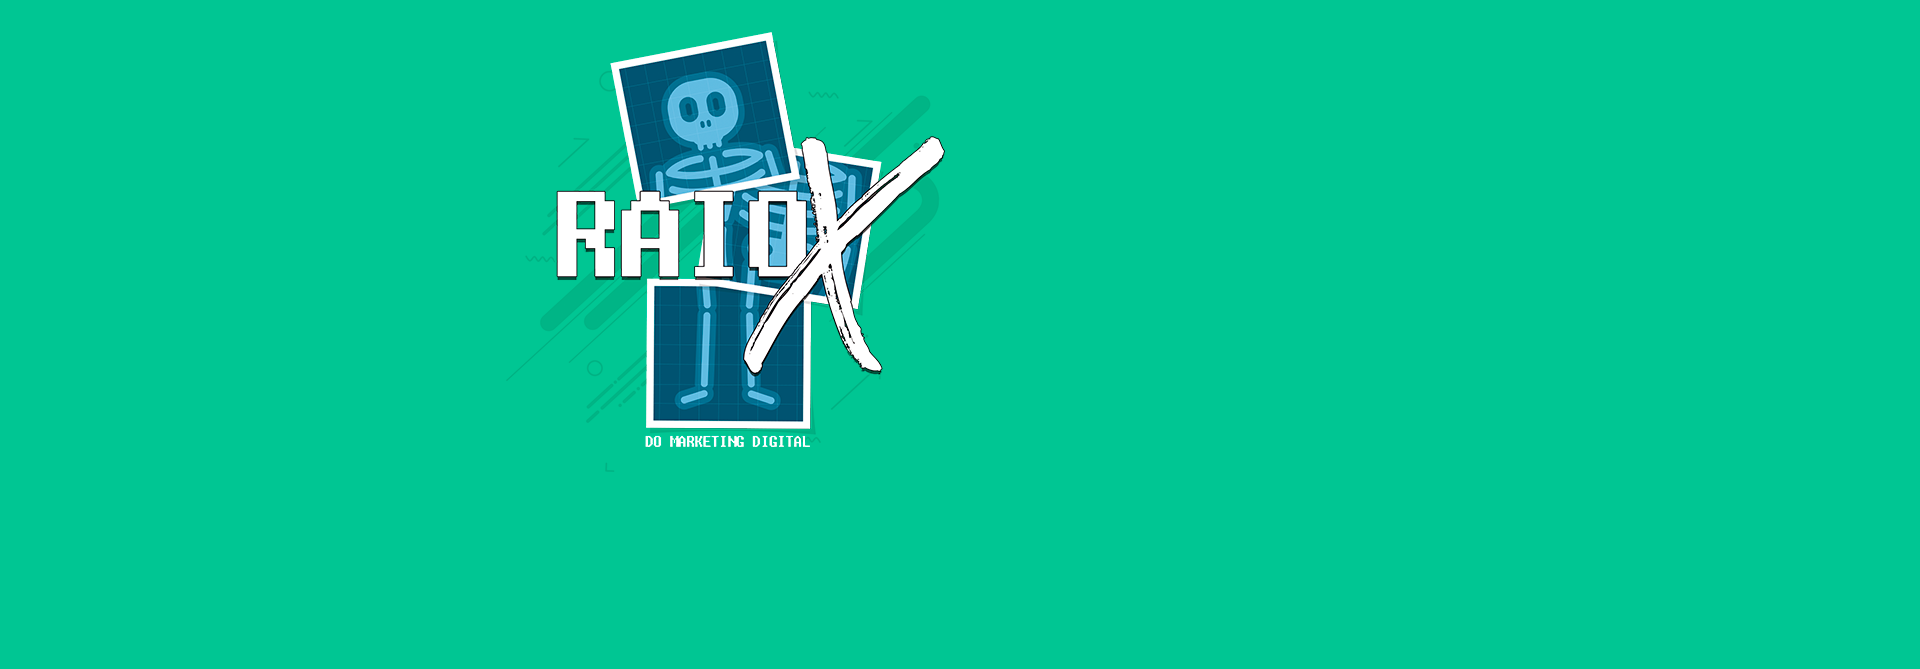 RaioX do Marketing Digital